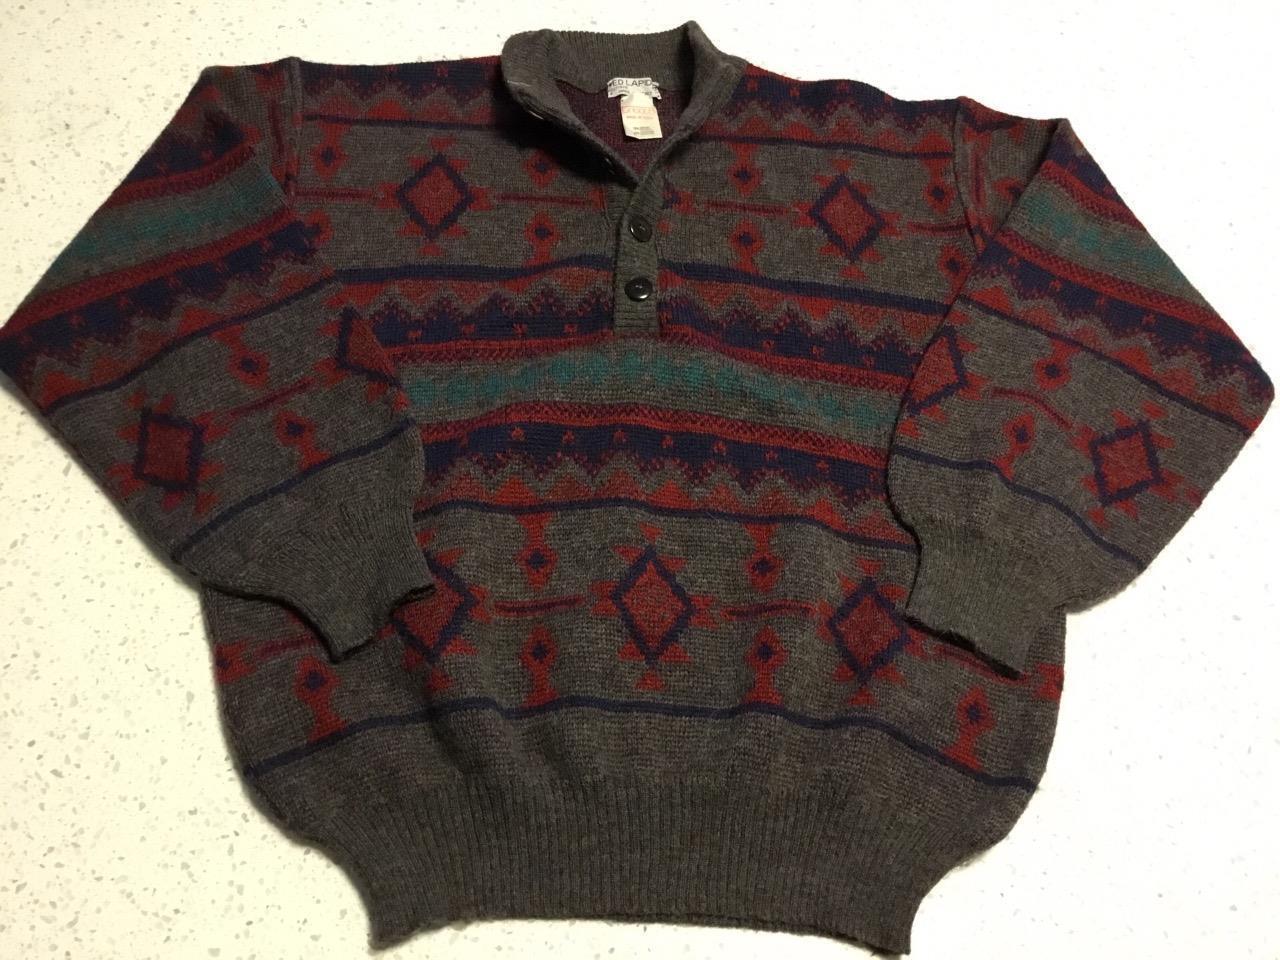 Vintage Ted Lapidus Wool Alpaca Sweater Adult Size Large  Tricot 5